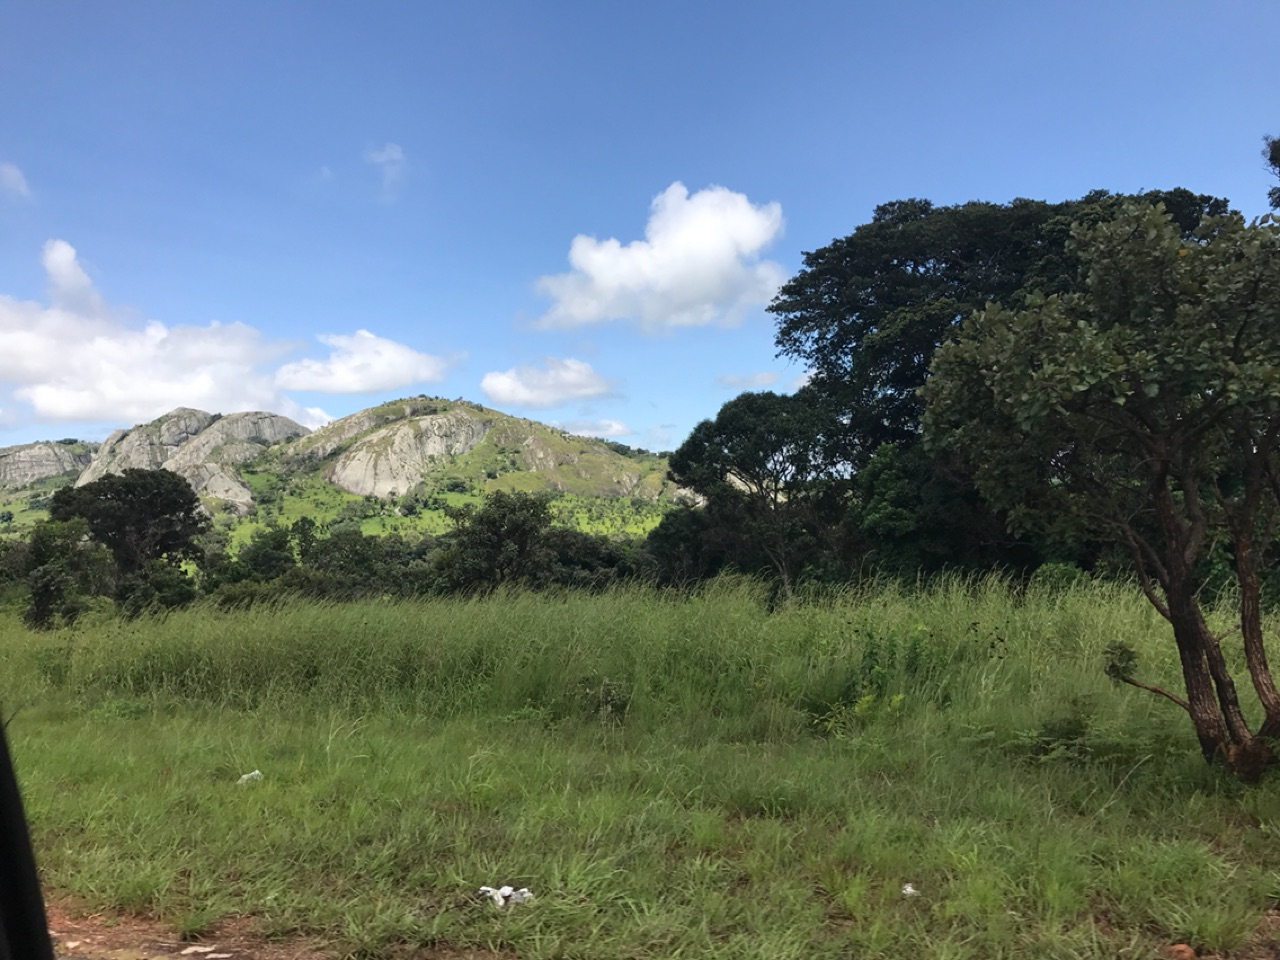 The road to Mzuzu